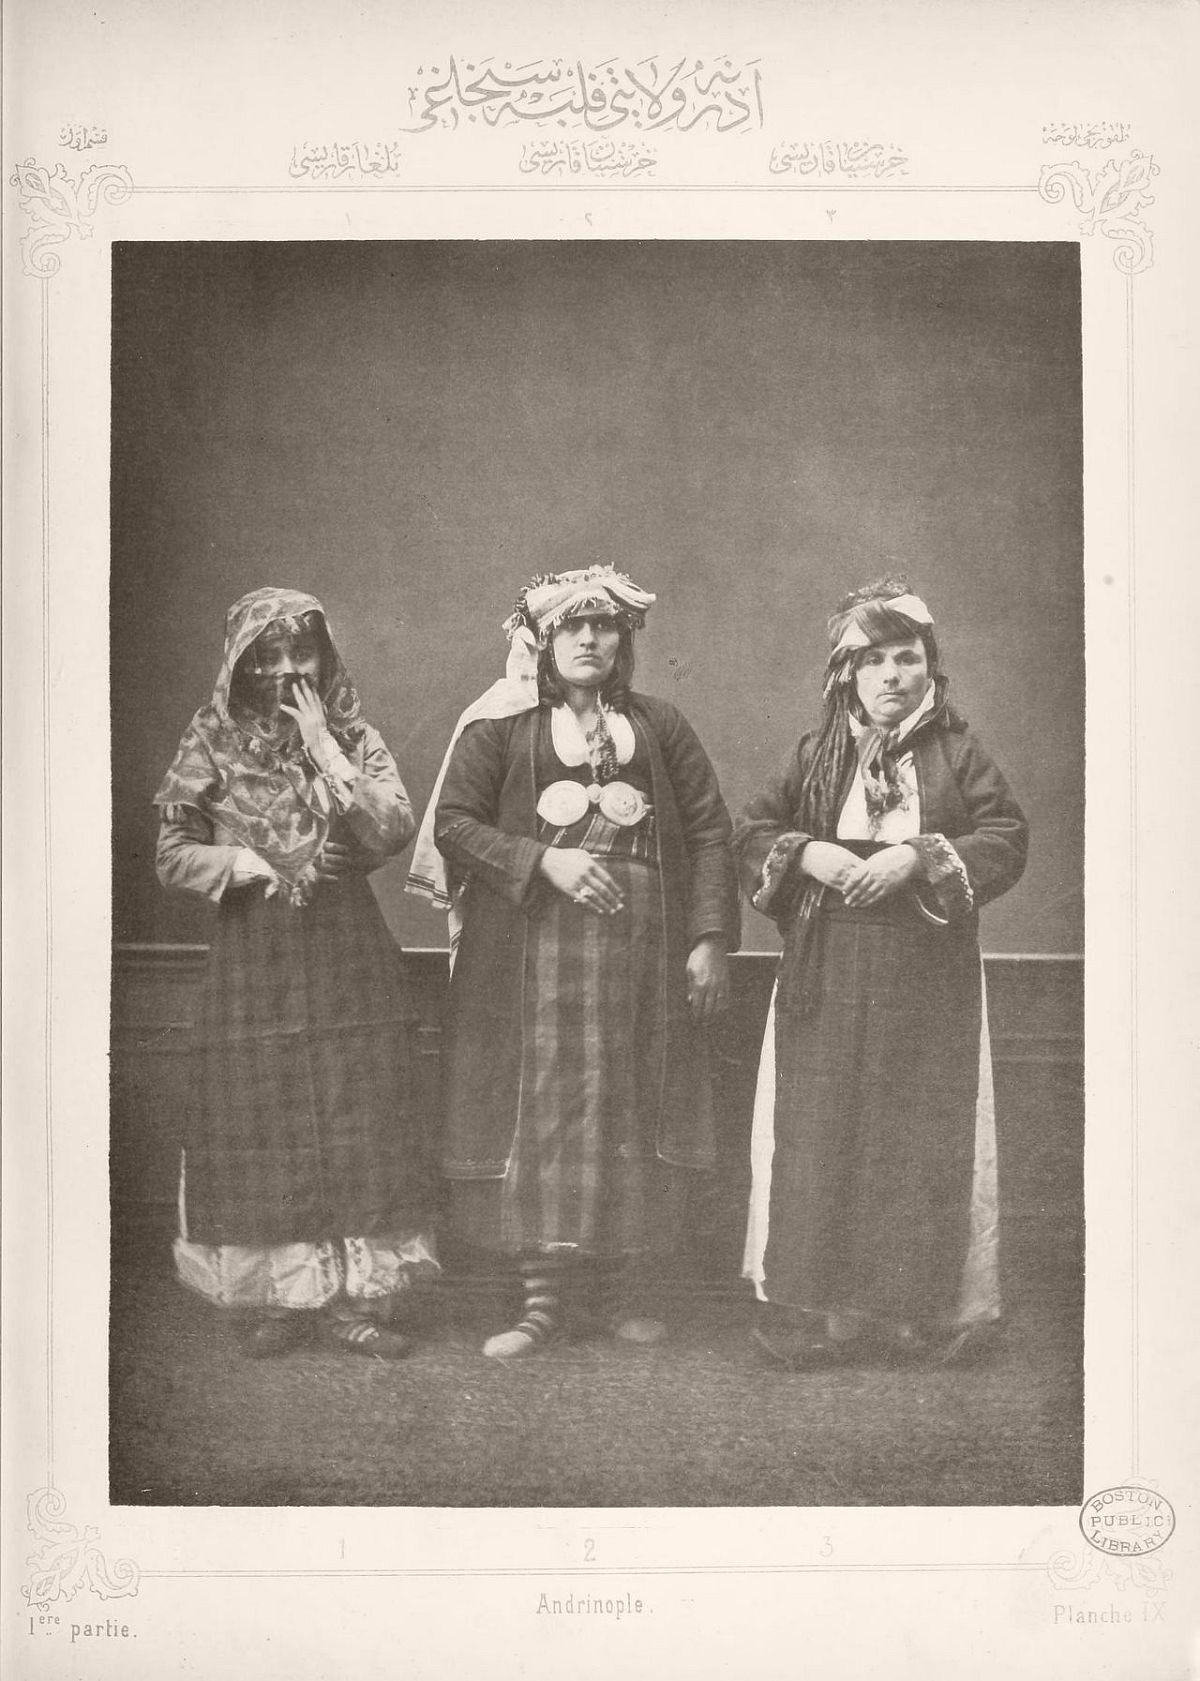 1. Bulgarian woman from Ahi Tchelebi 2. Greek woman from Haskovo 3. Peasant woman from Baidjas